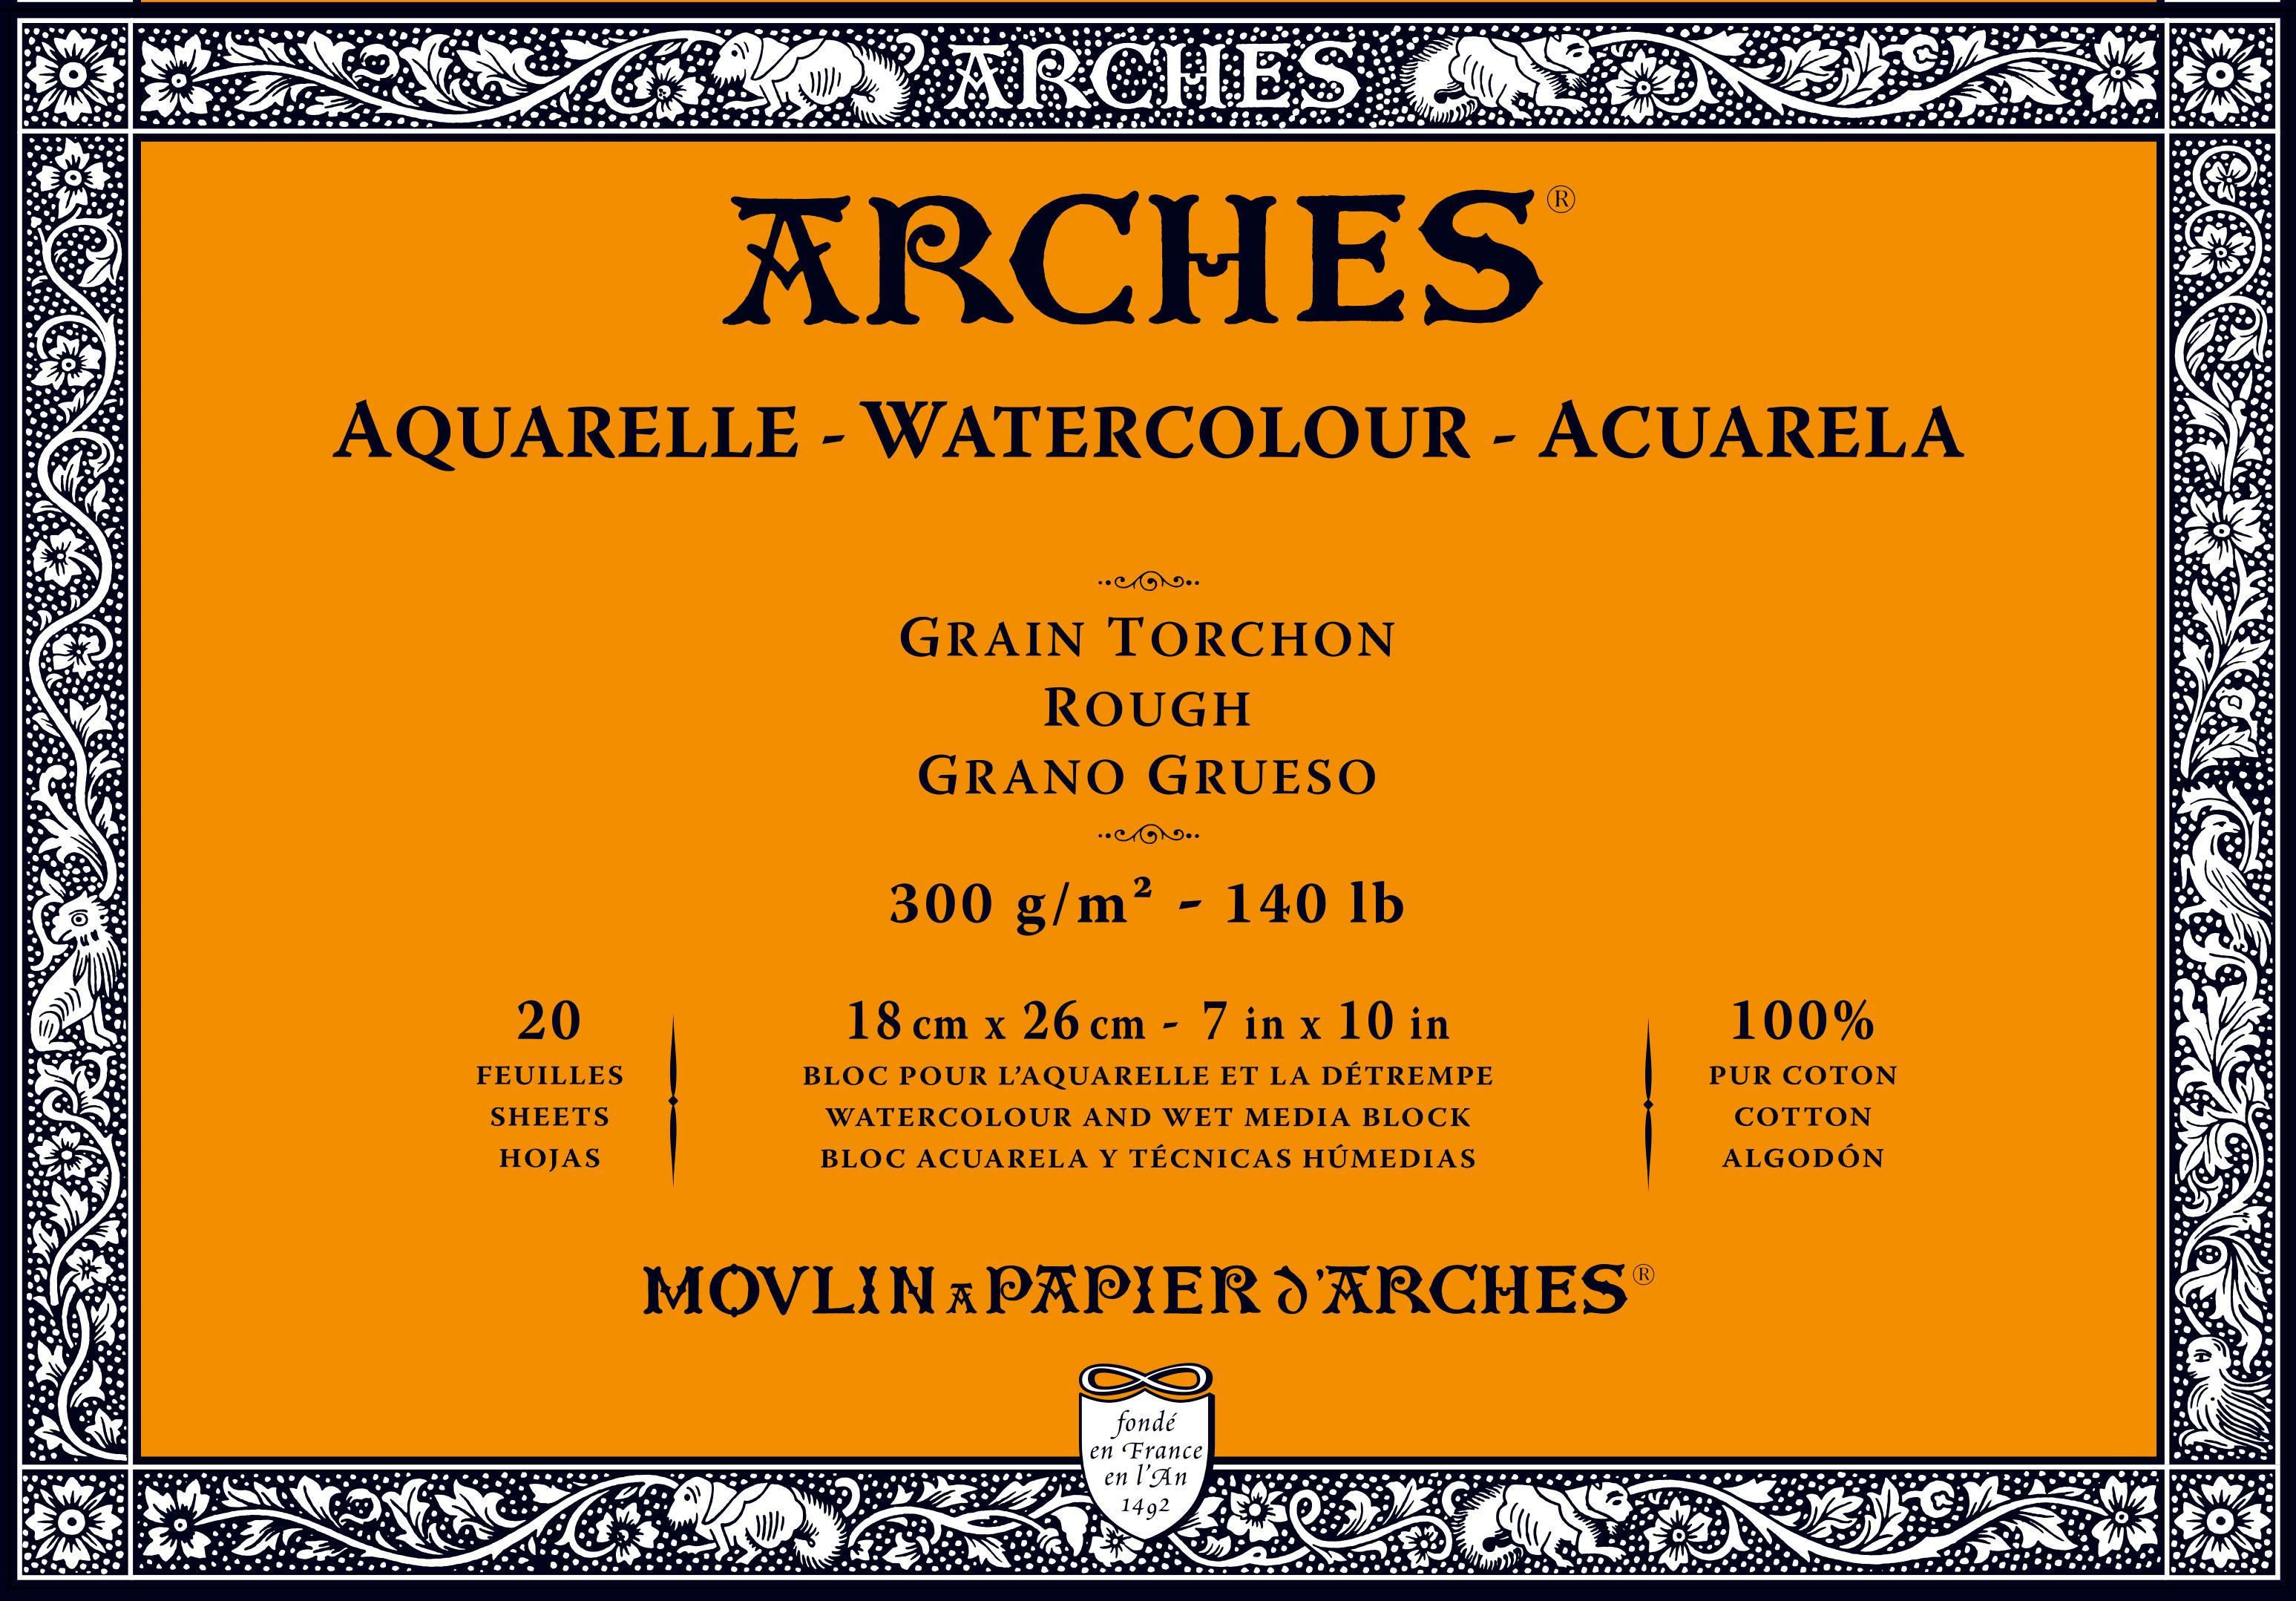 Venta pintura online: Bloc Arches 300gr/grueso 18x26